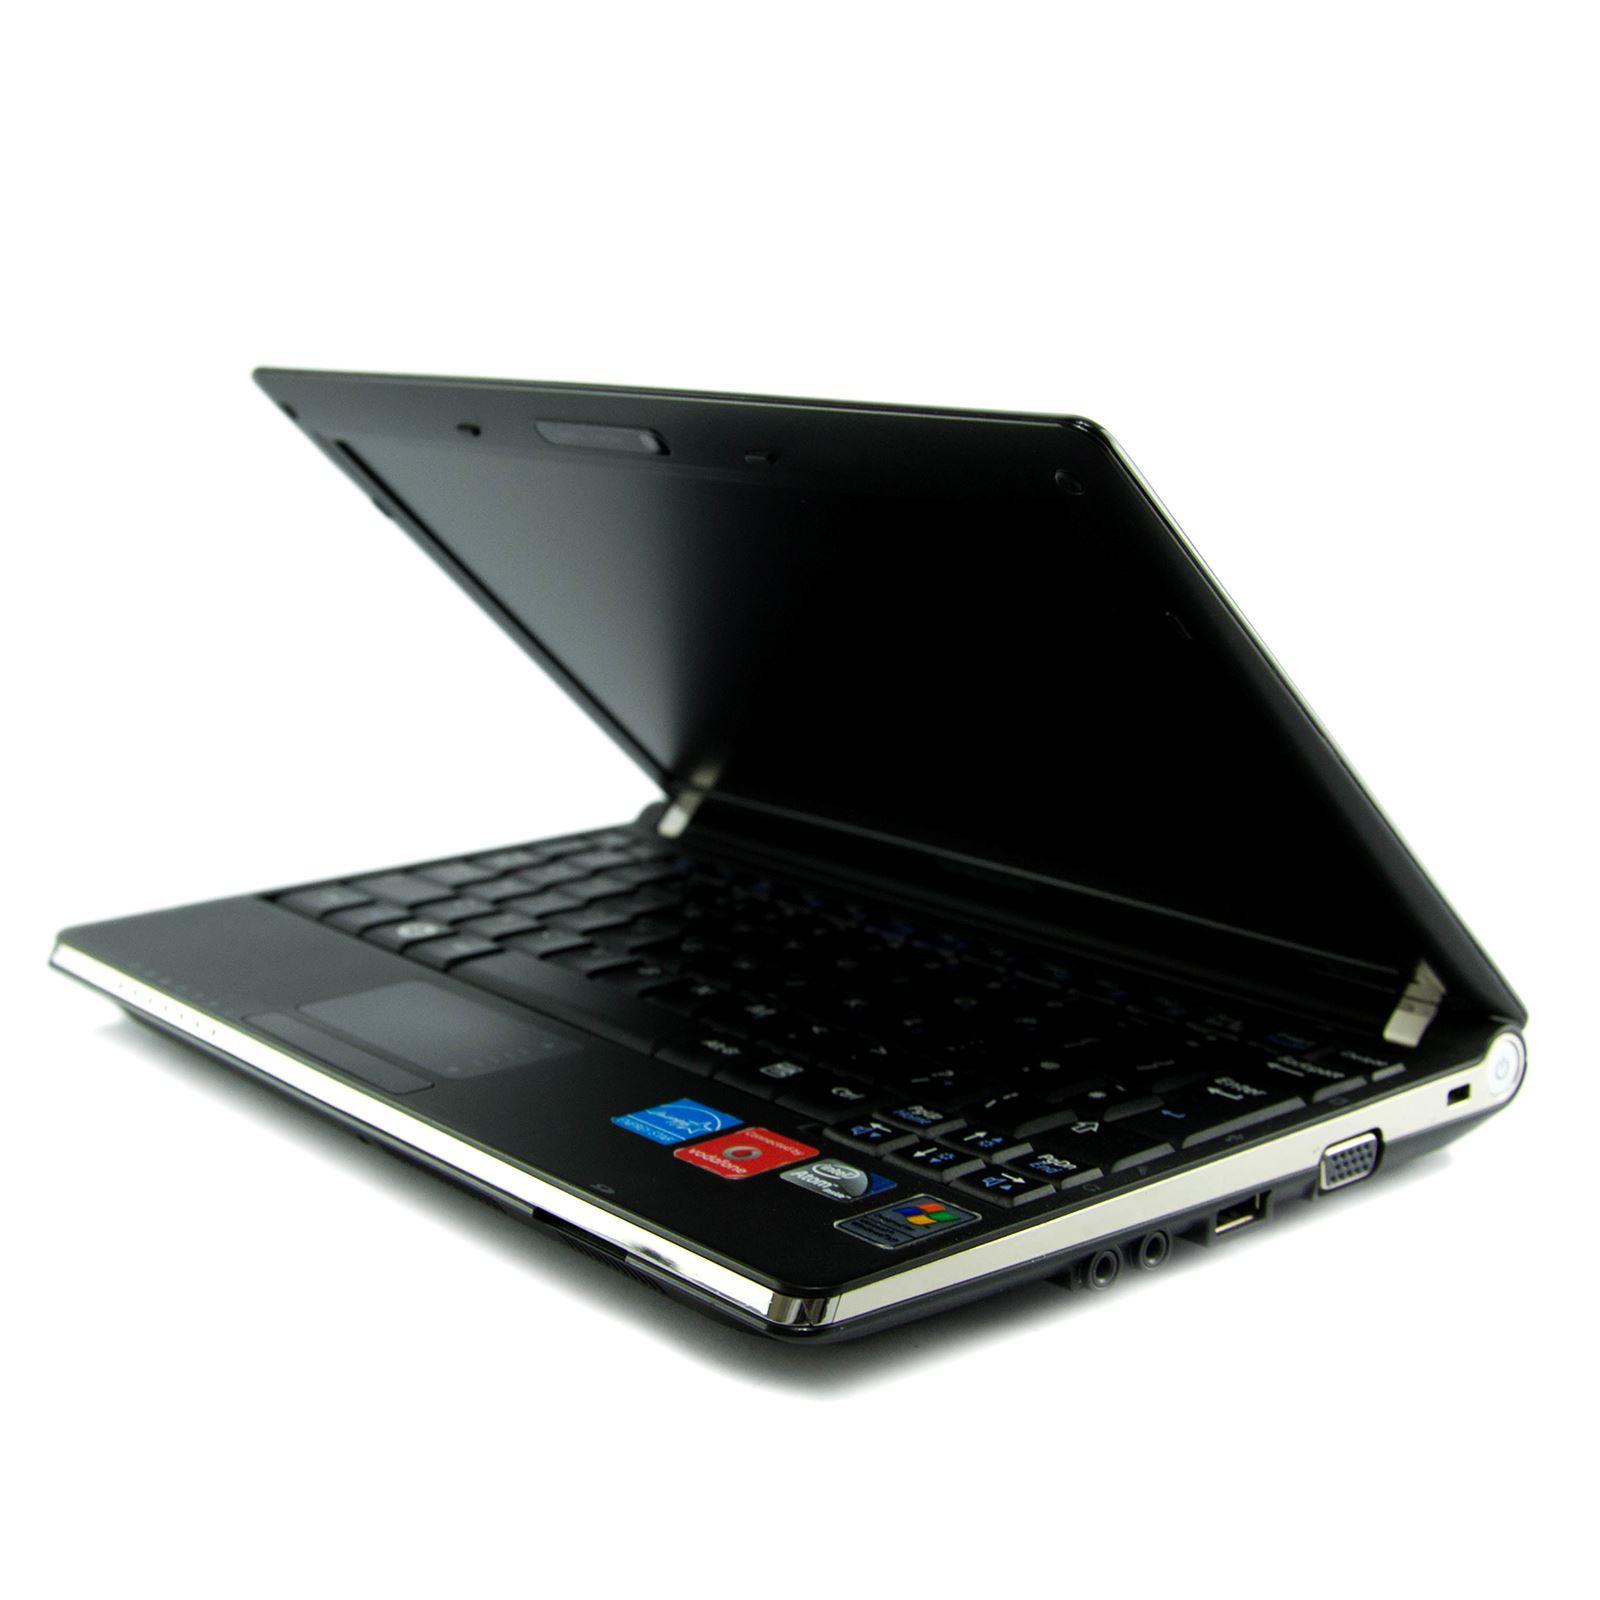 Notebook samsung 10 inch - Samsung N Series Nc10 10 2 Inch 160gb